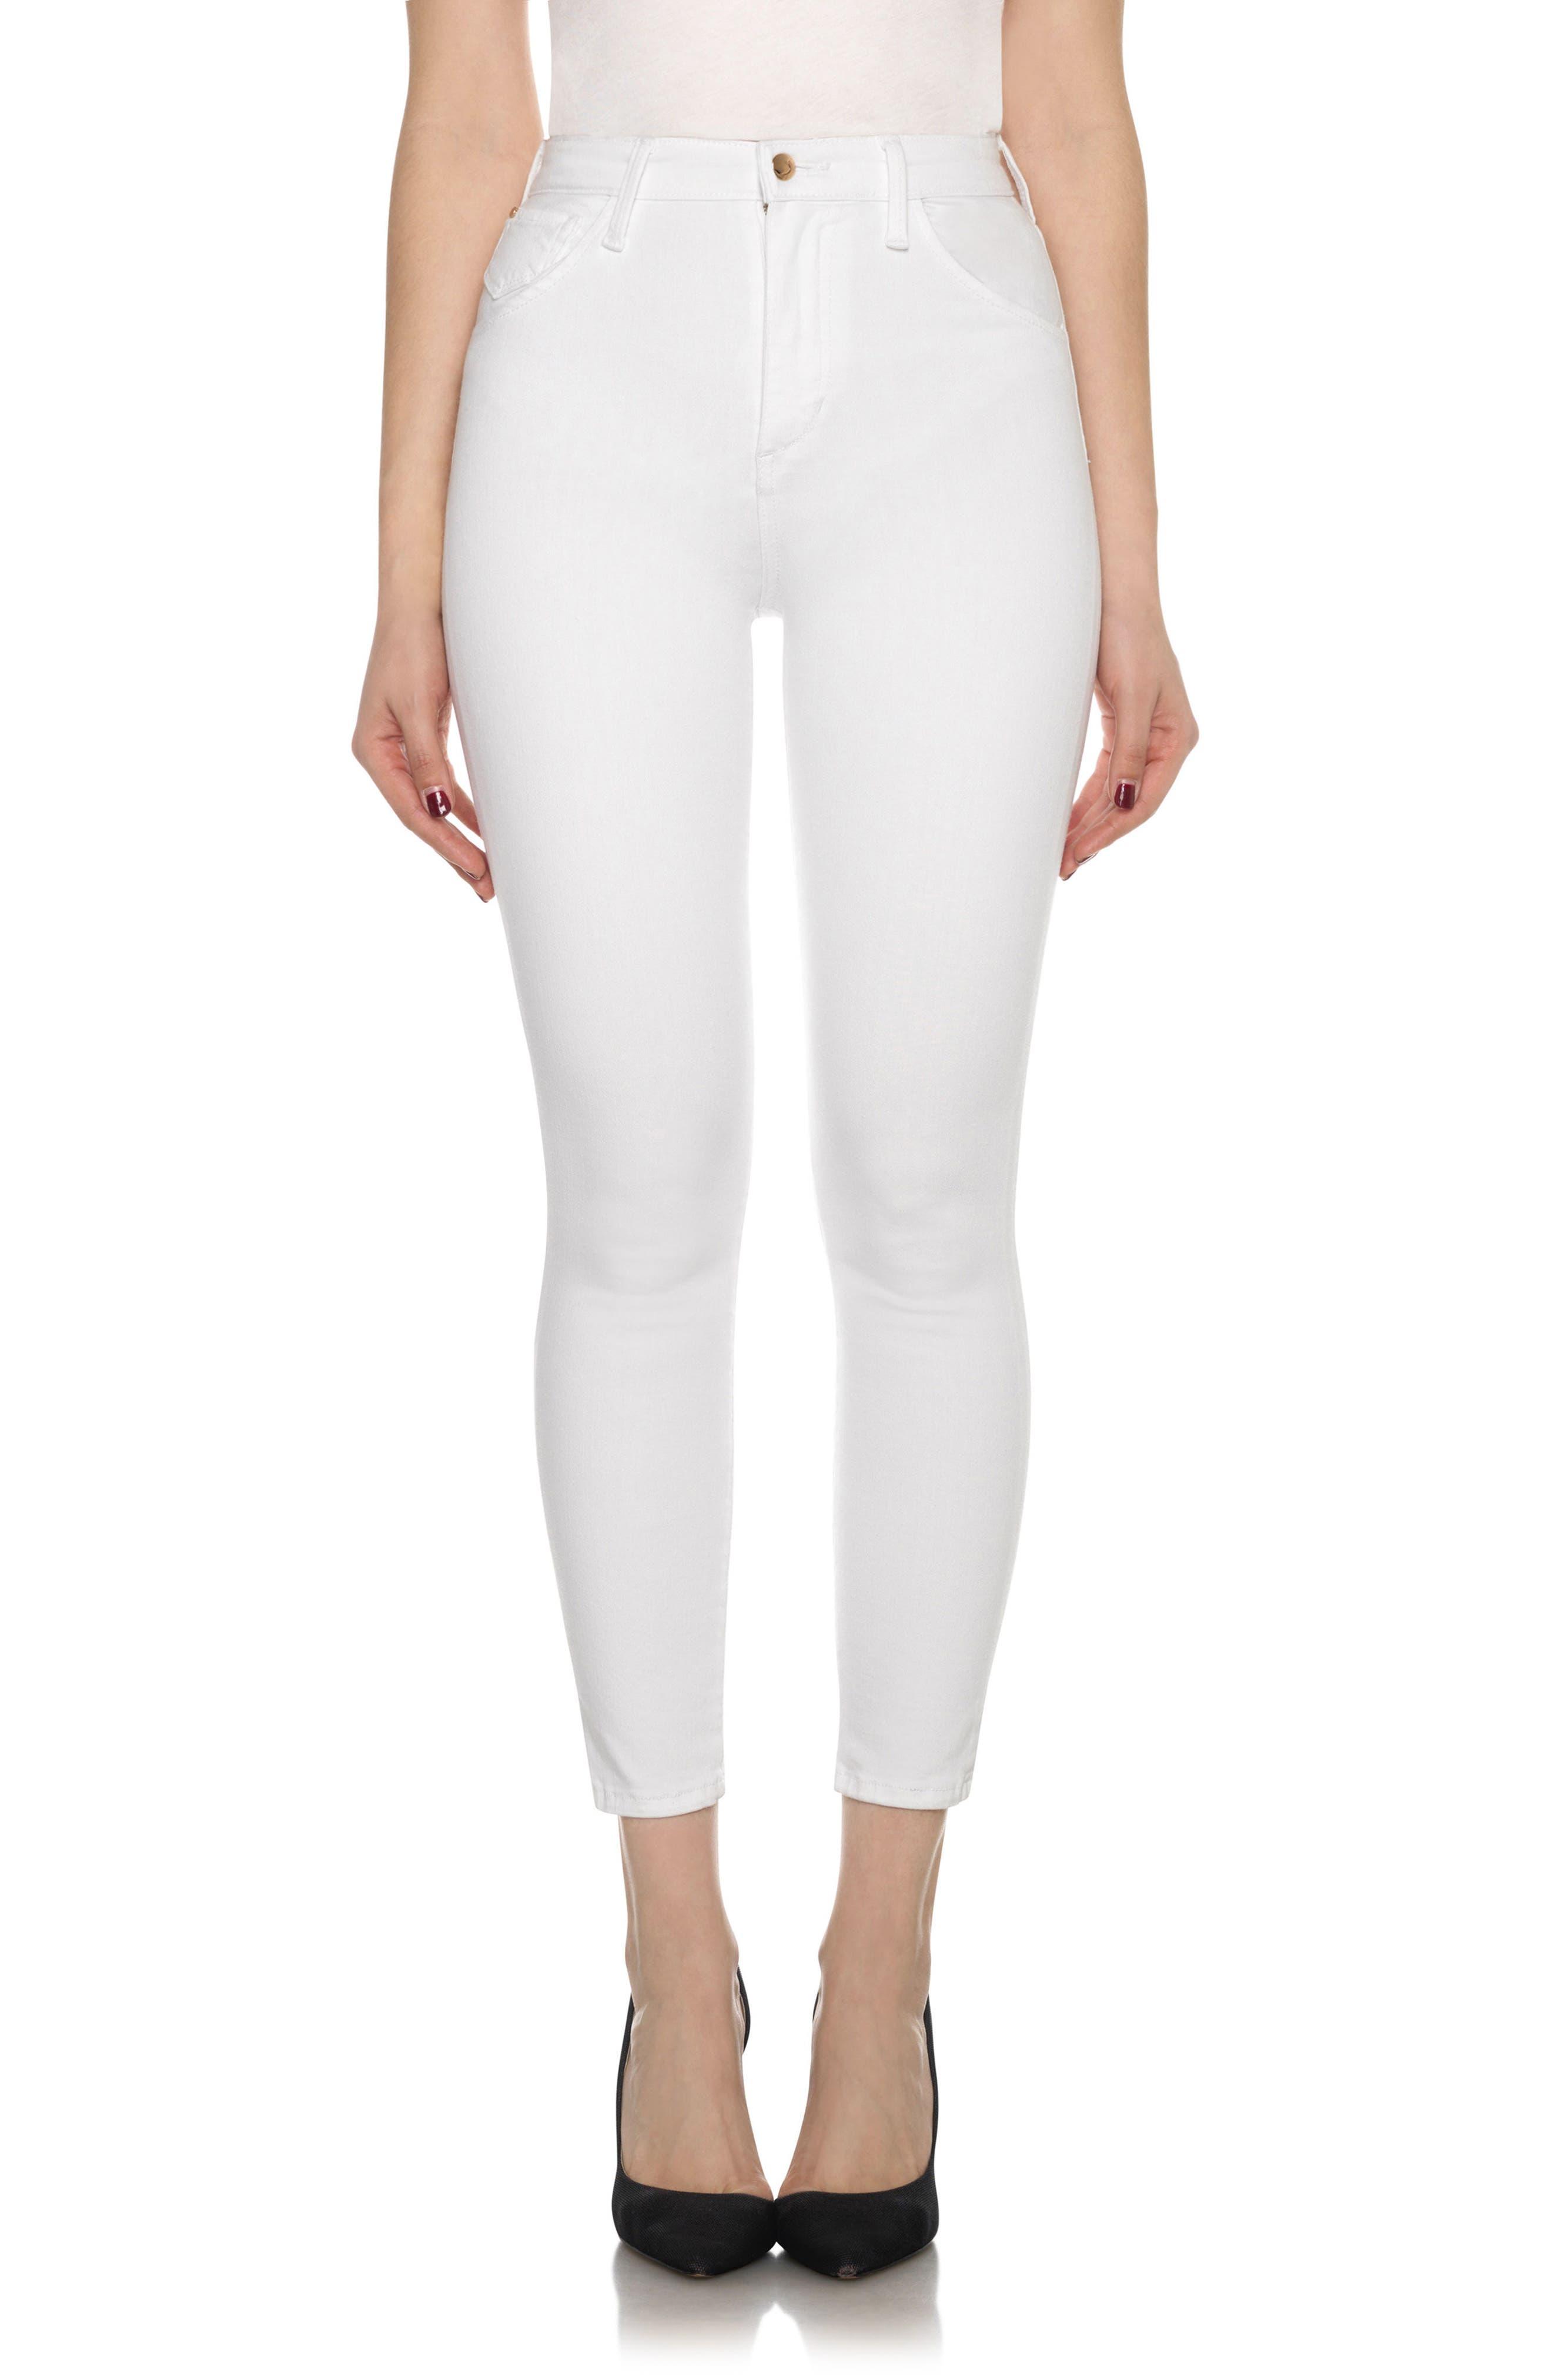 Bella High Waist Crop Skinny Jeans,                             Main thumbnail 1, color,                             120